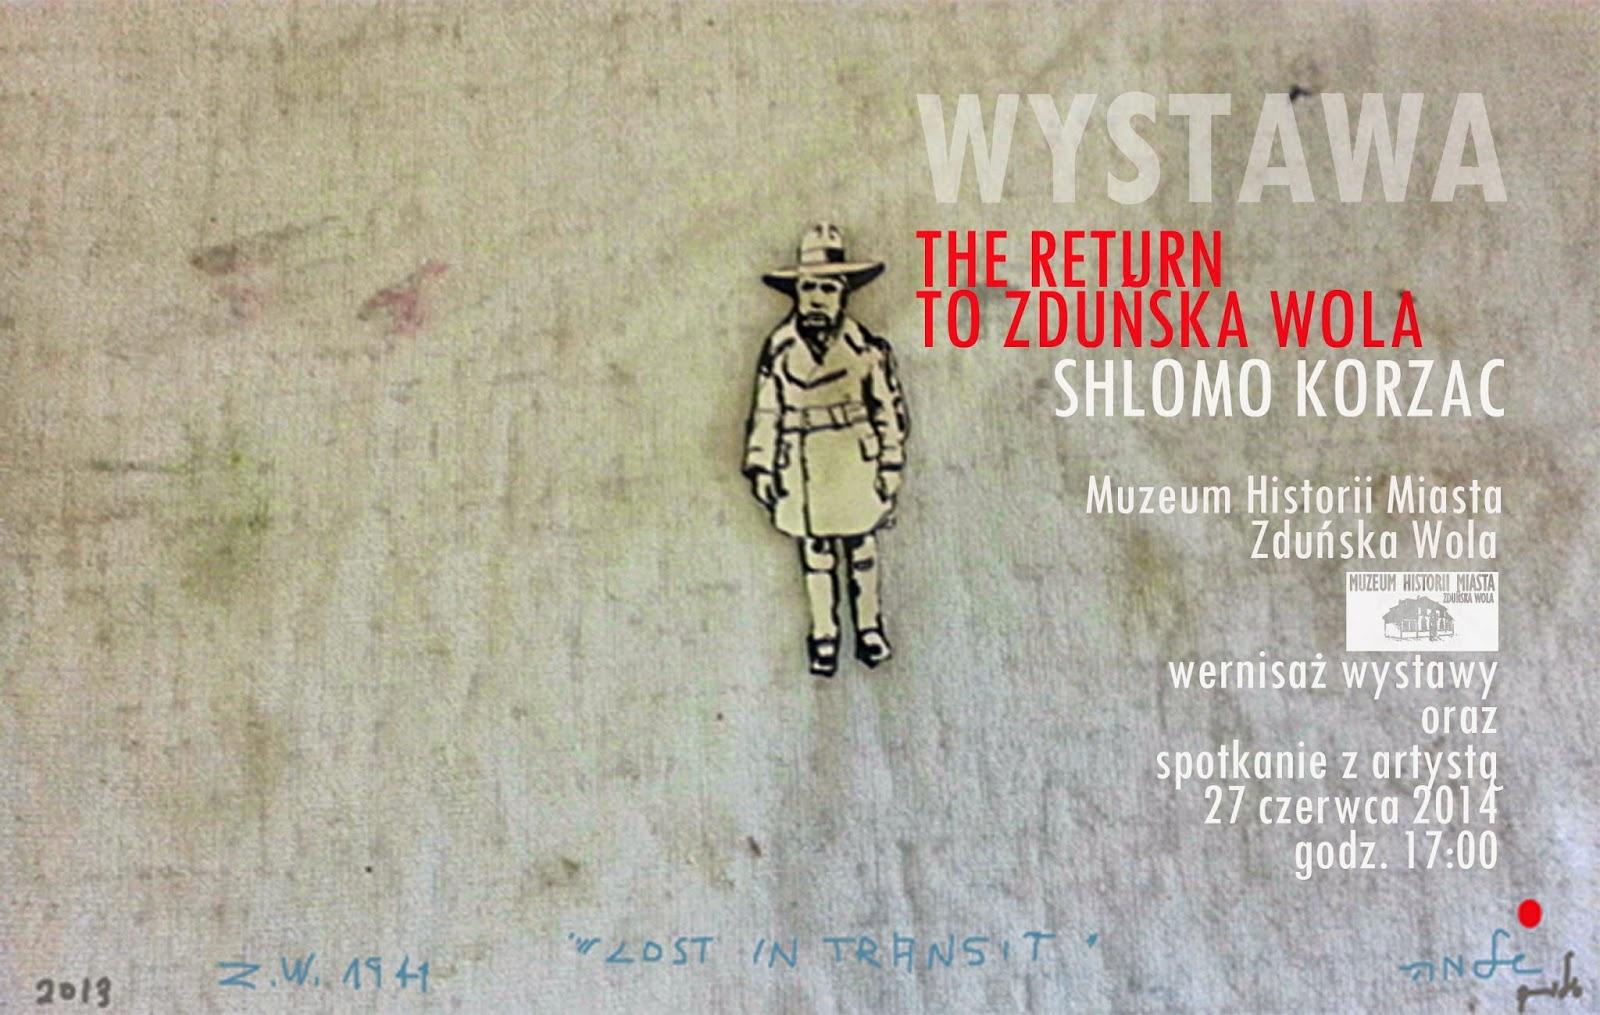 http://kafee.wordpress.com/2014/06/02/the-return-to-zdunska-wola/